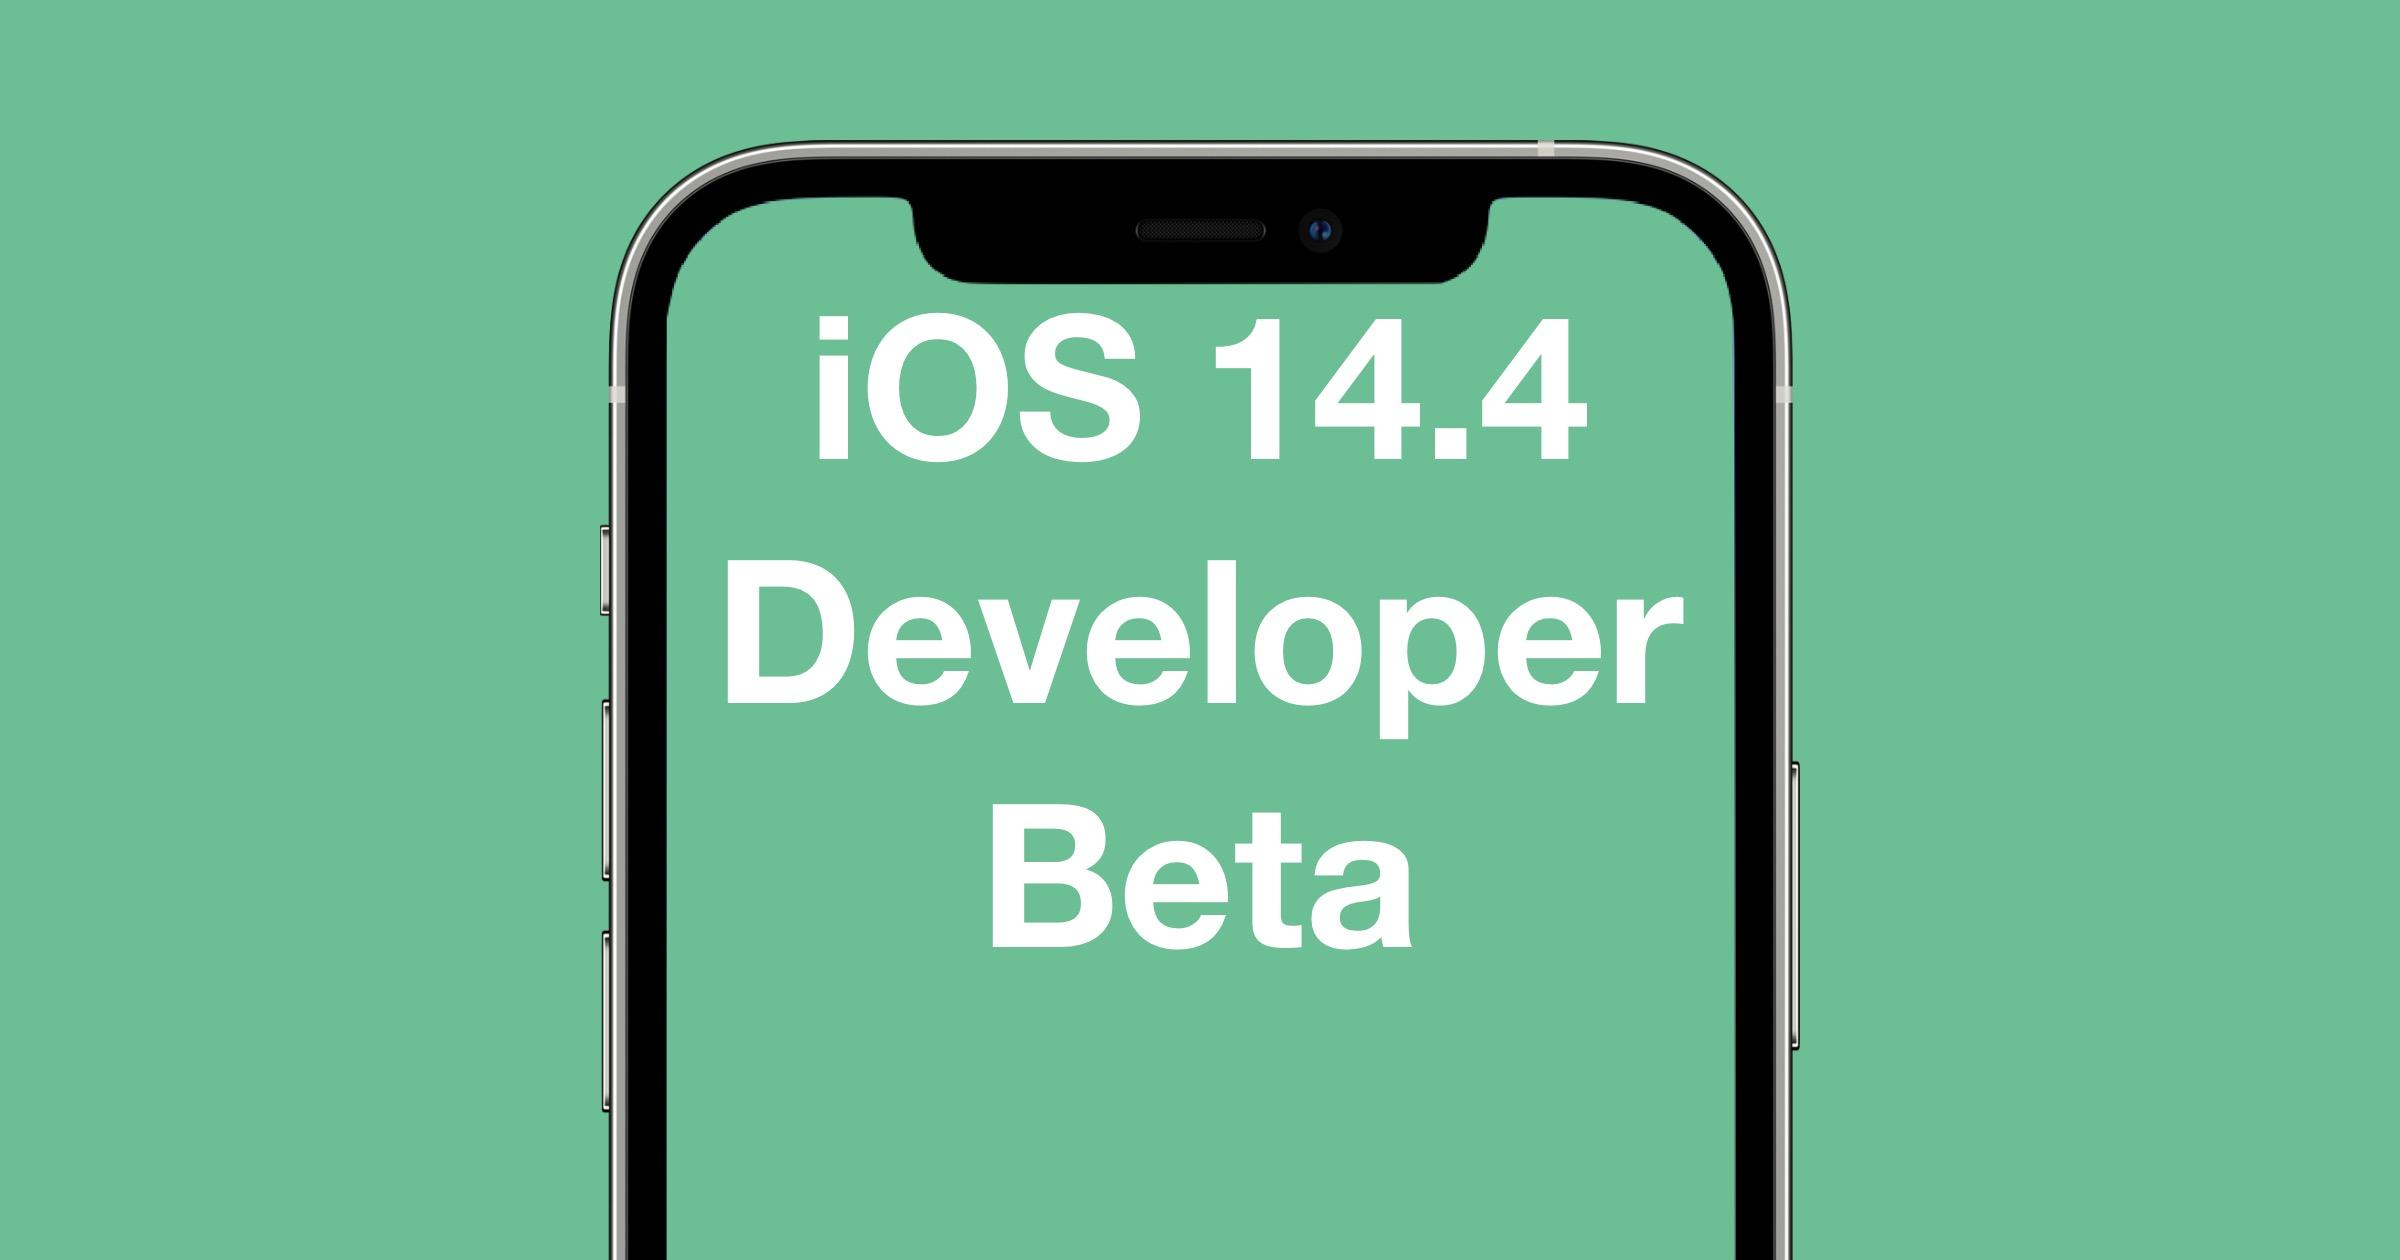 iOS 14.4 developer beta